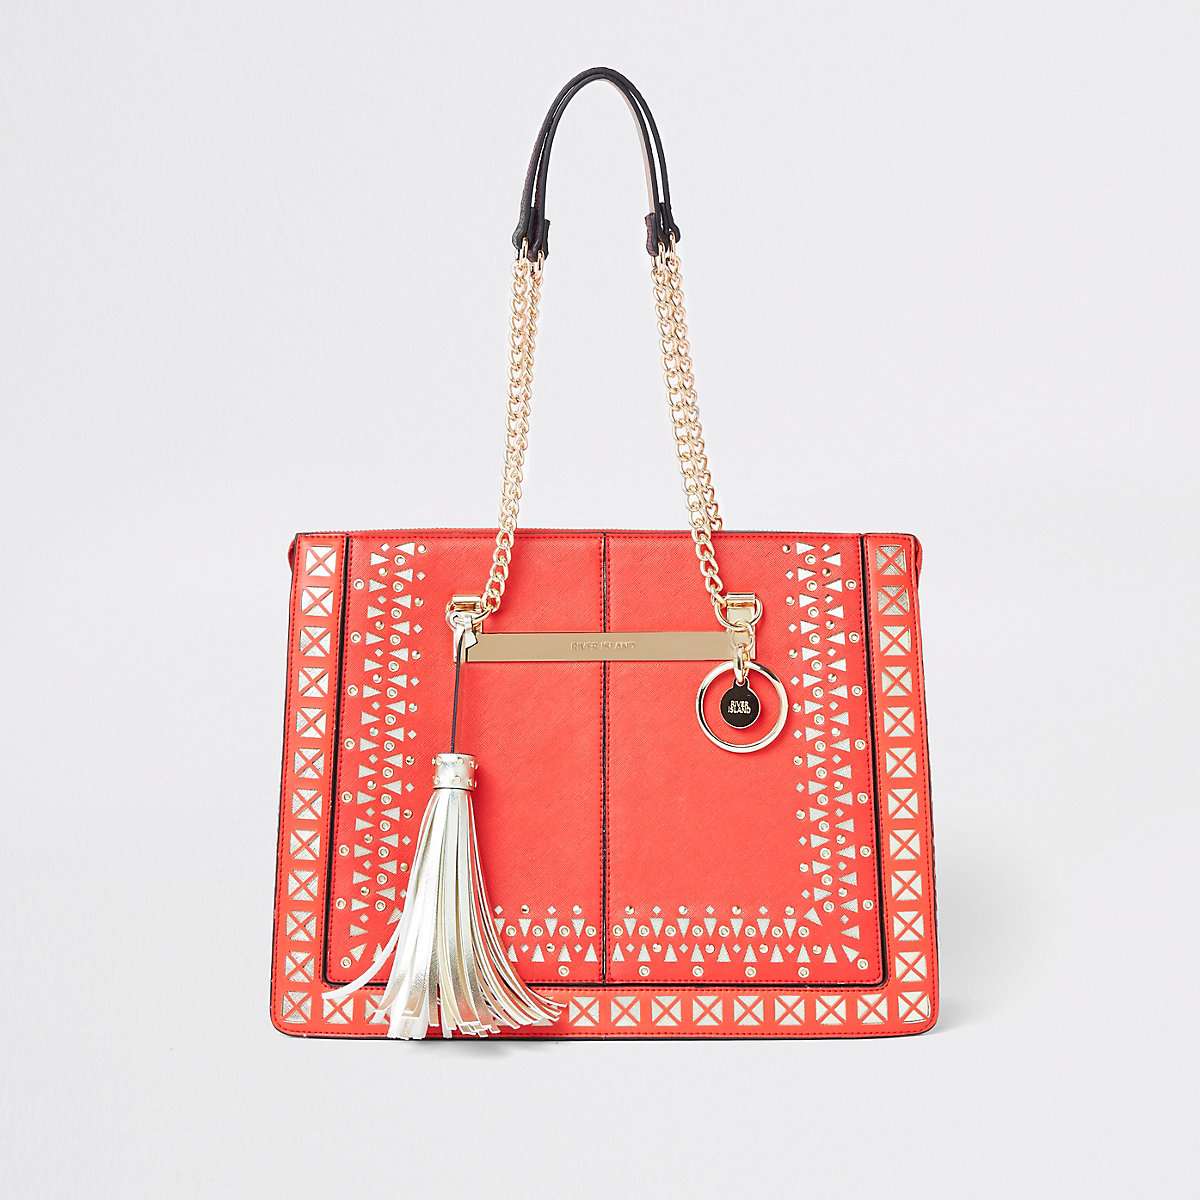 Red lasercut chain handle tote bag